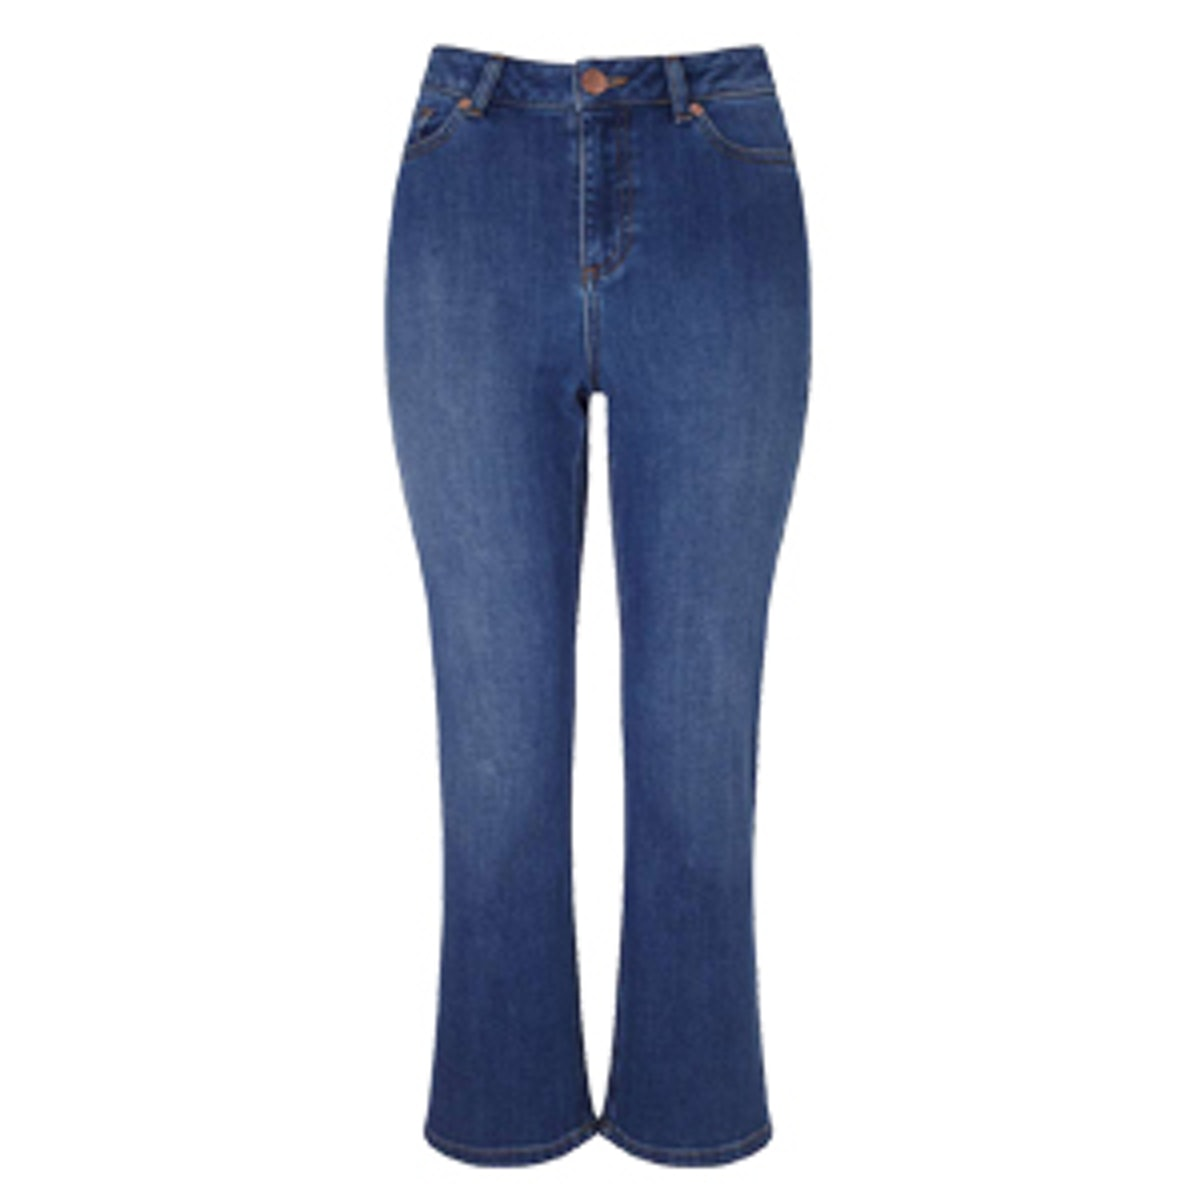 Cropped Kickflare Jean